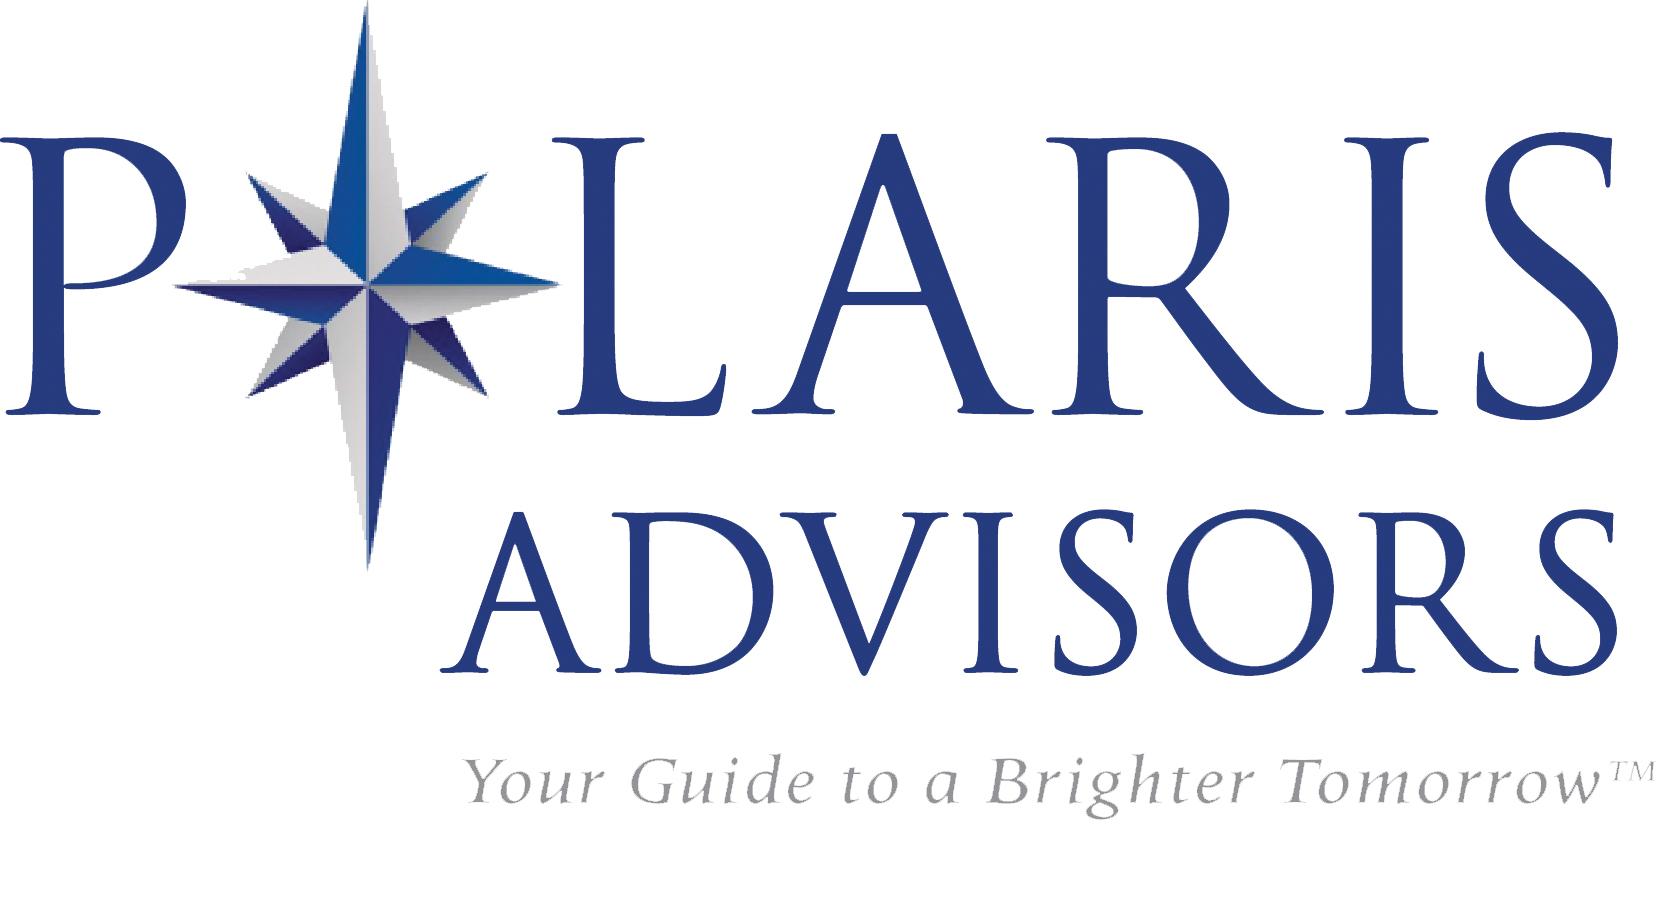 Polaris Advisors Sponsor Logo